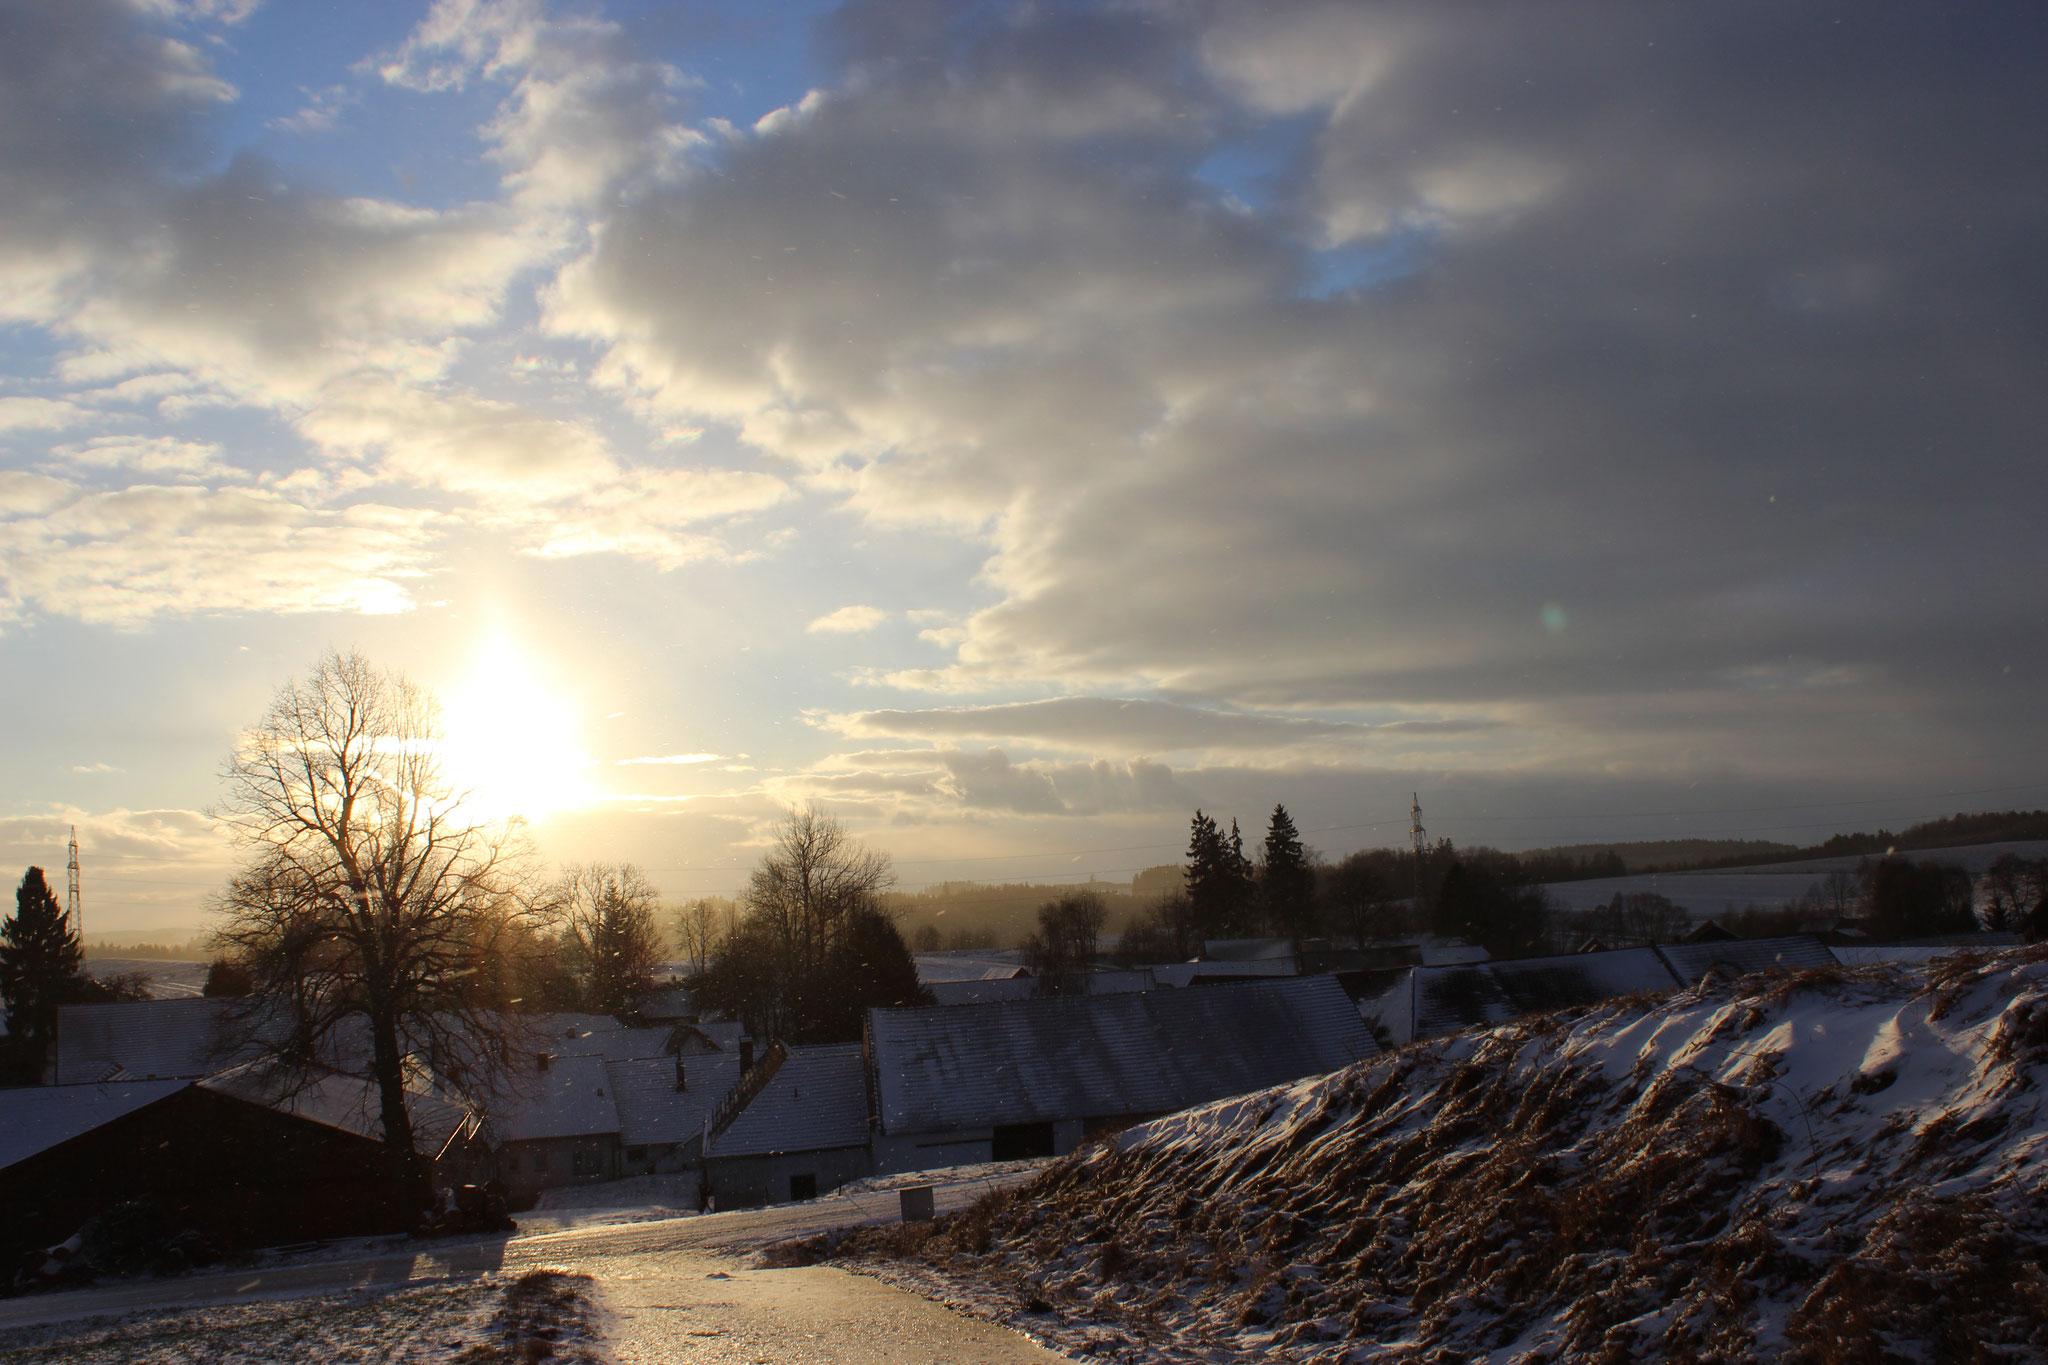 Winter-Märchen-Landschaft